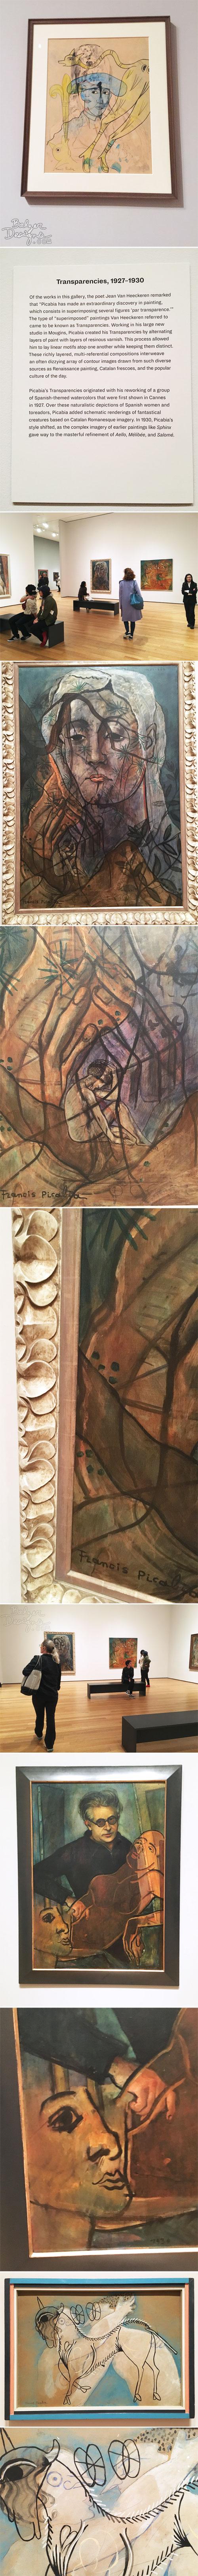 Picabia6-wm